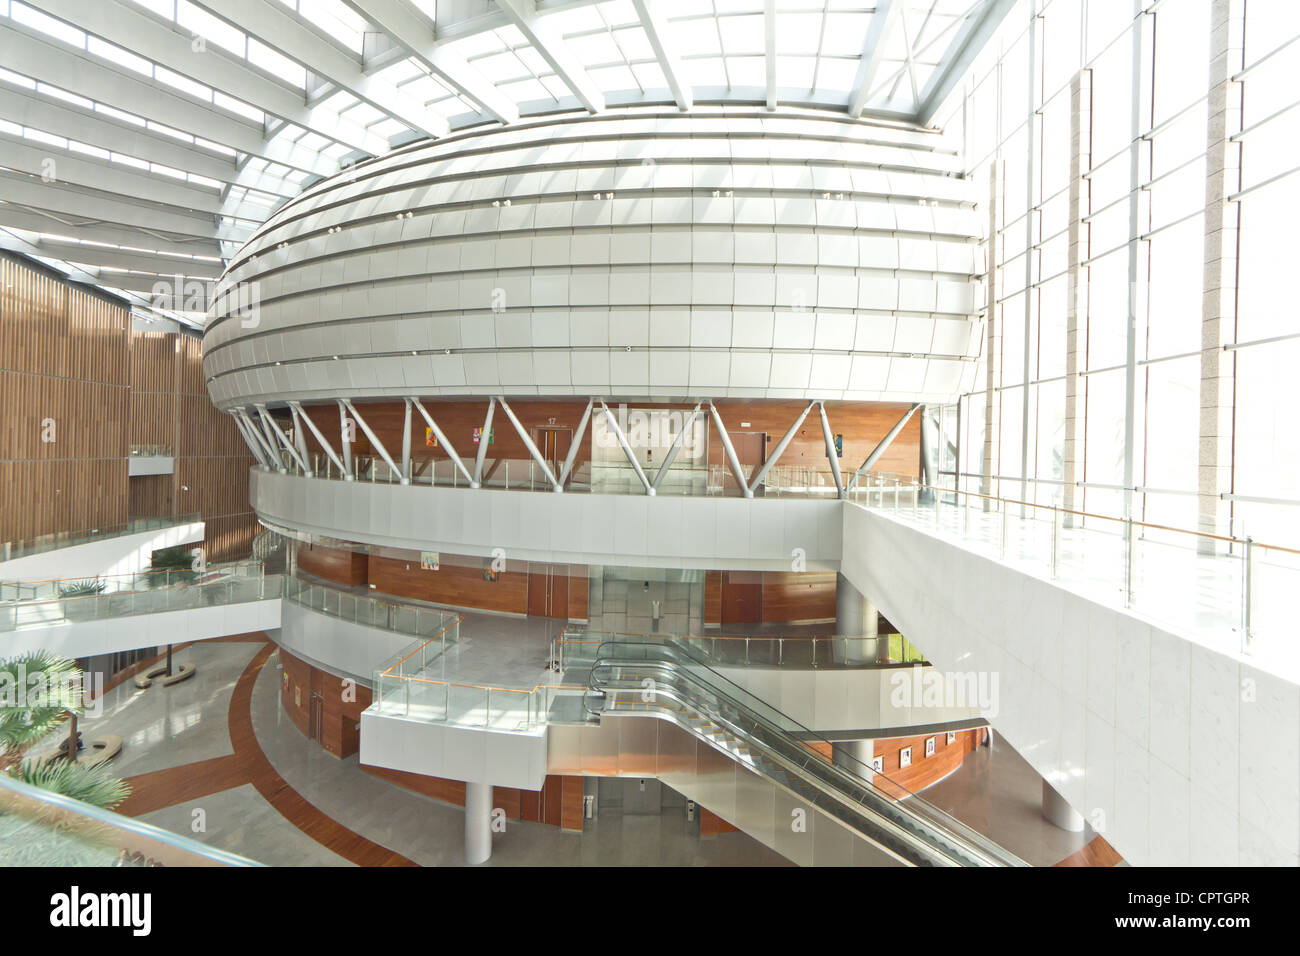 Addis Ababa Building Stock Photos & Addis Ababa Building Stock ...